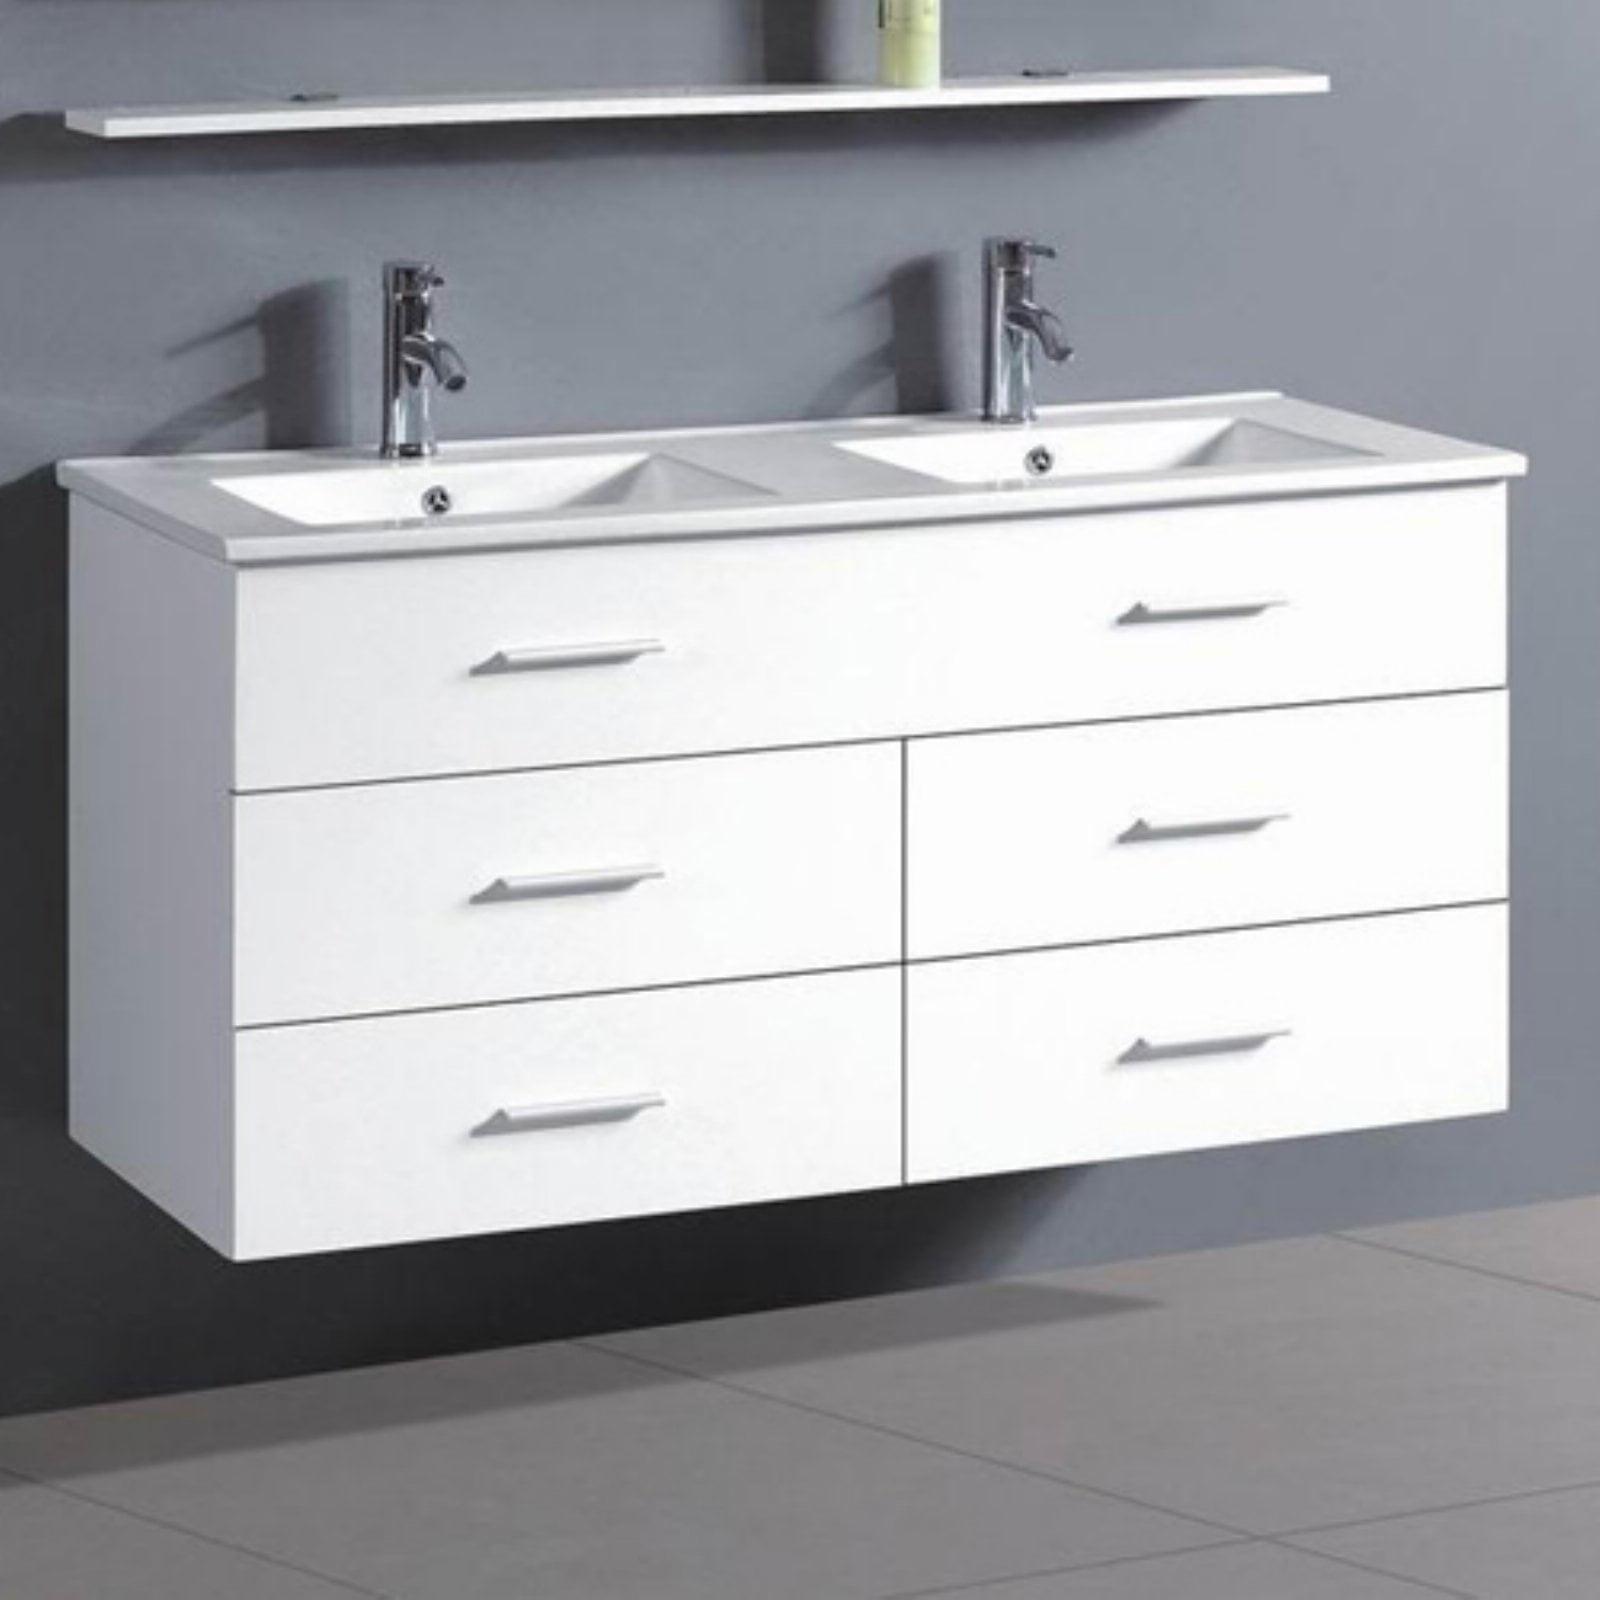 Belvedere 48 in. Contemporary Floating Double Bathroom Vanity